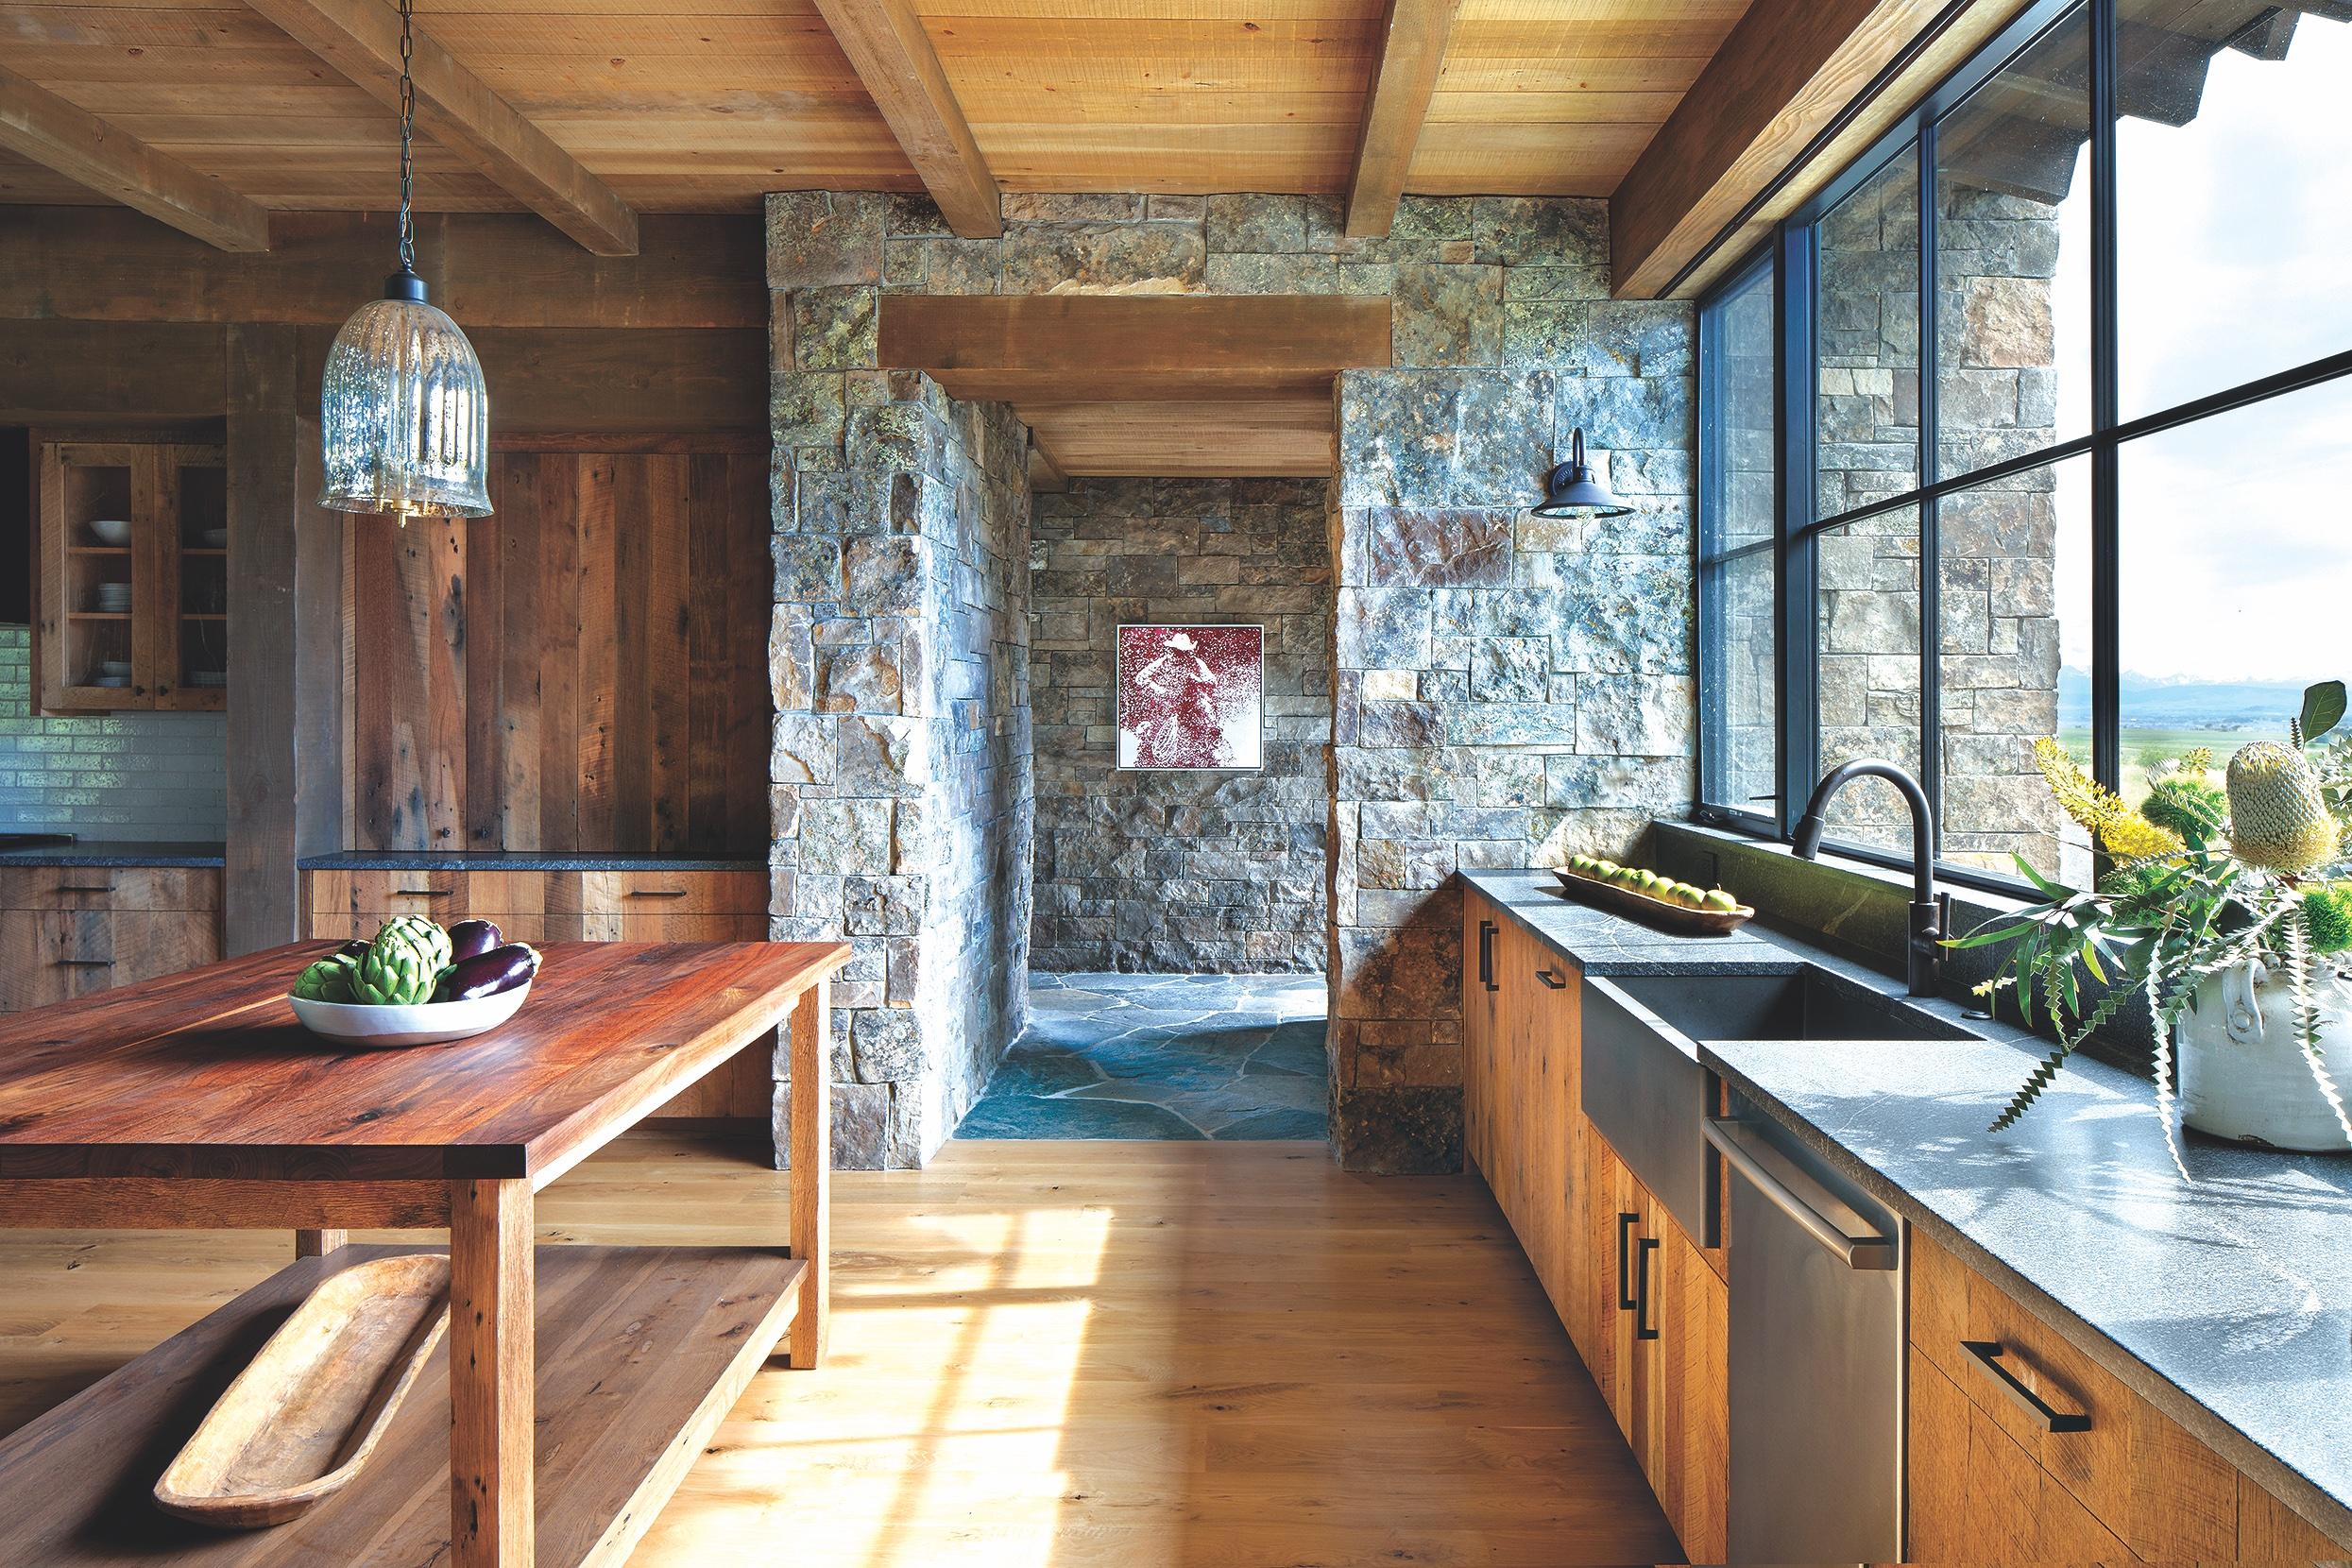 Limestone Kit Sink